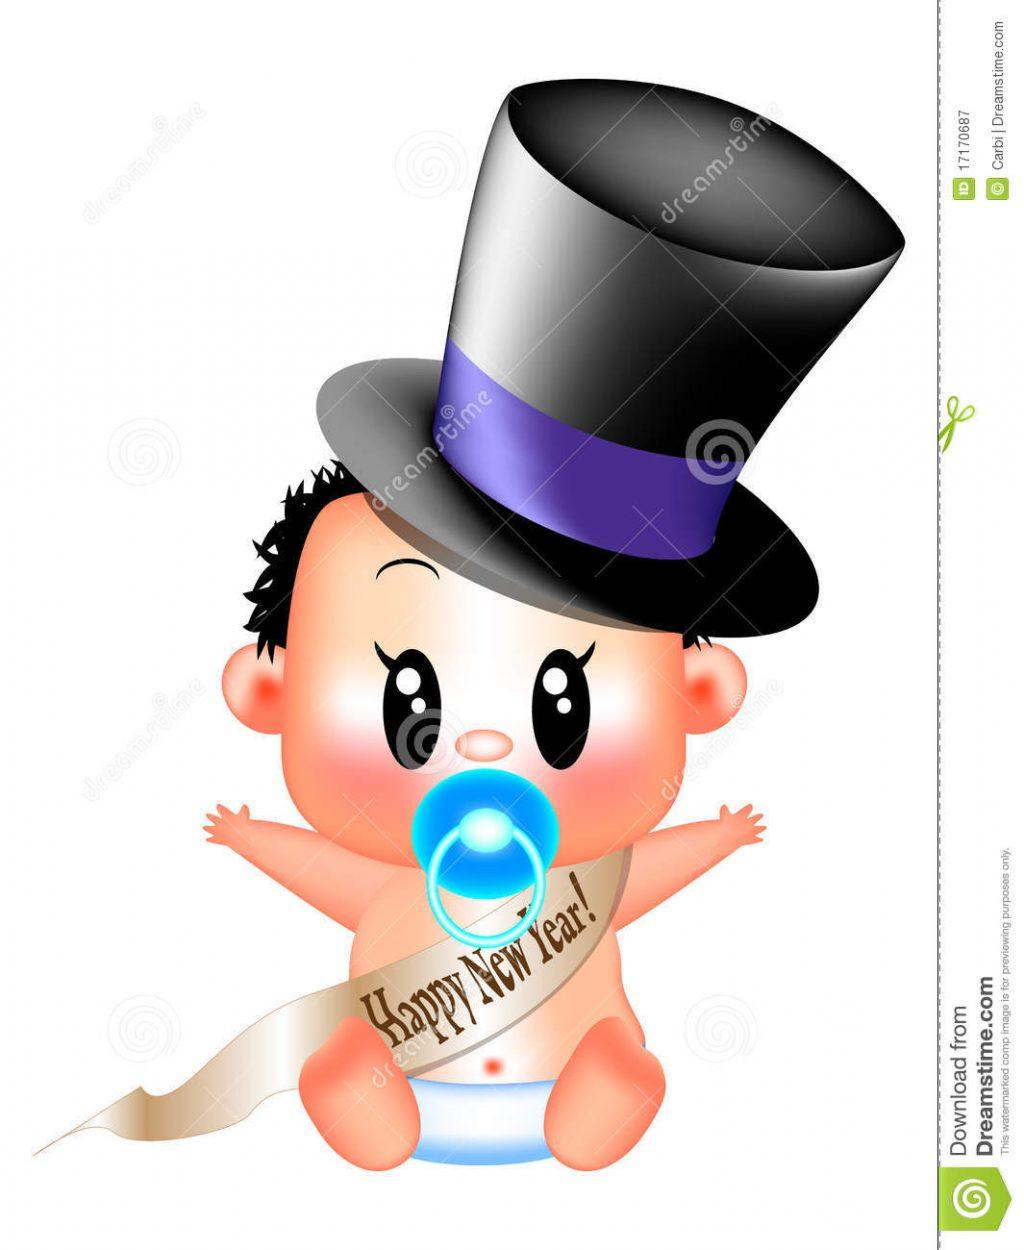 1024x1250 Uncategorized ~ Uncategorized Have Happy New Year Best Wishes